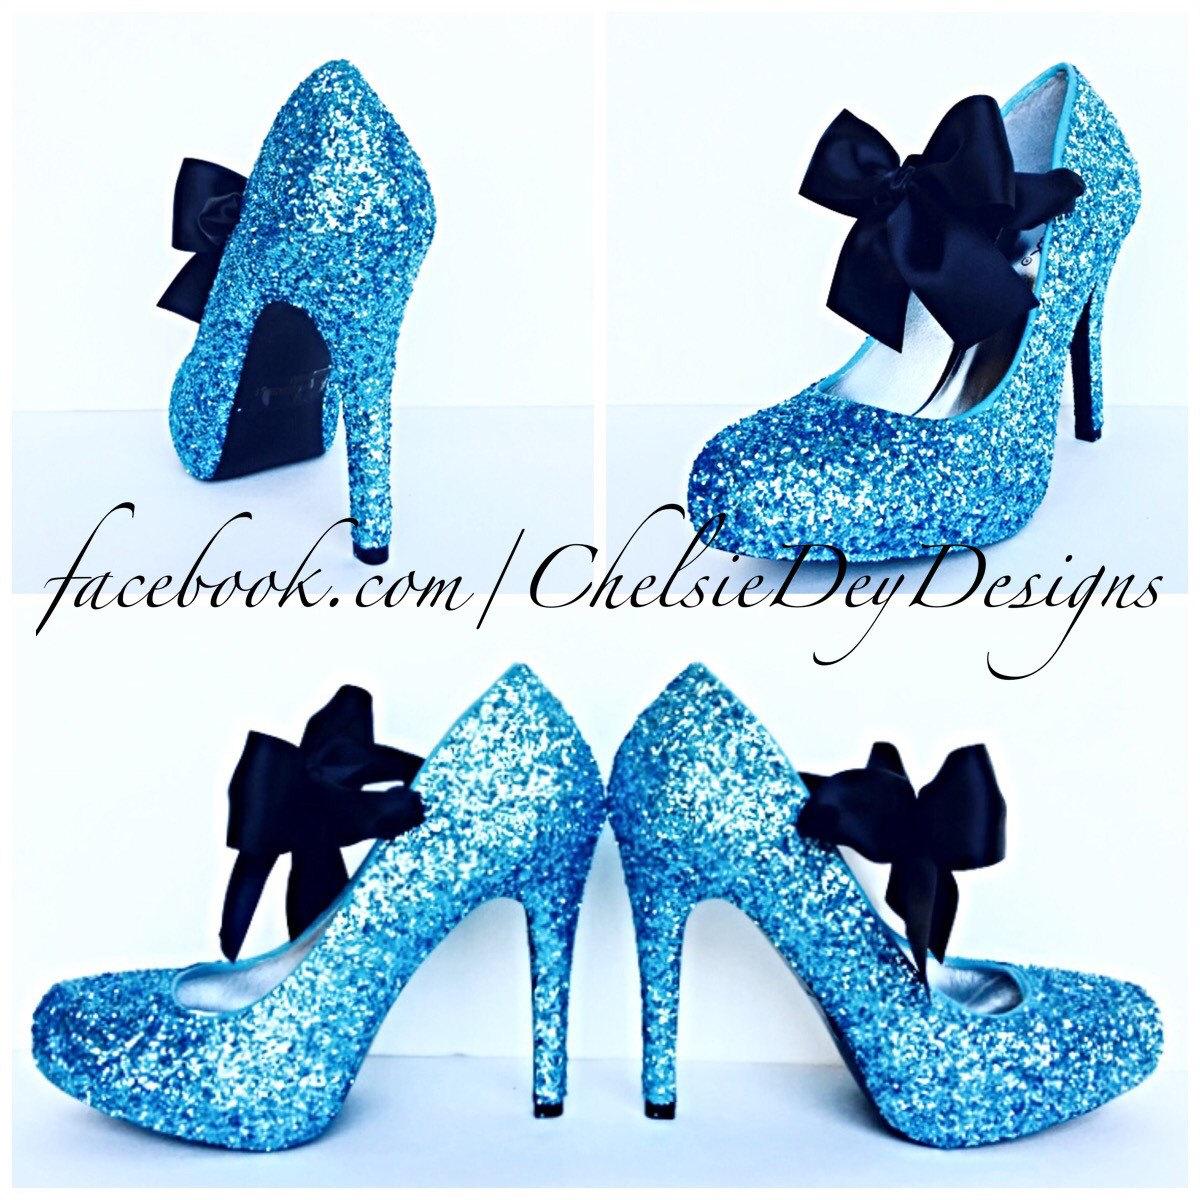 Glitter High Heels - Light Blue Pumps -Aqua Turquoise Ice Calypso - Black  Satin Bows c36dd8d56